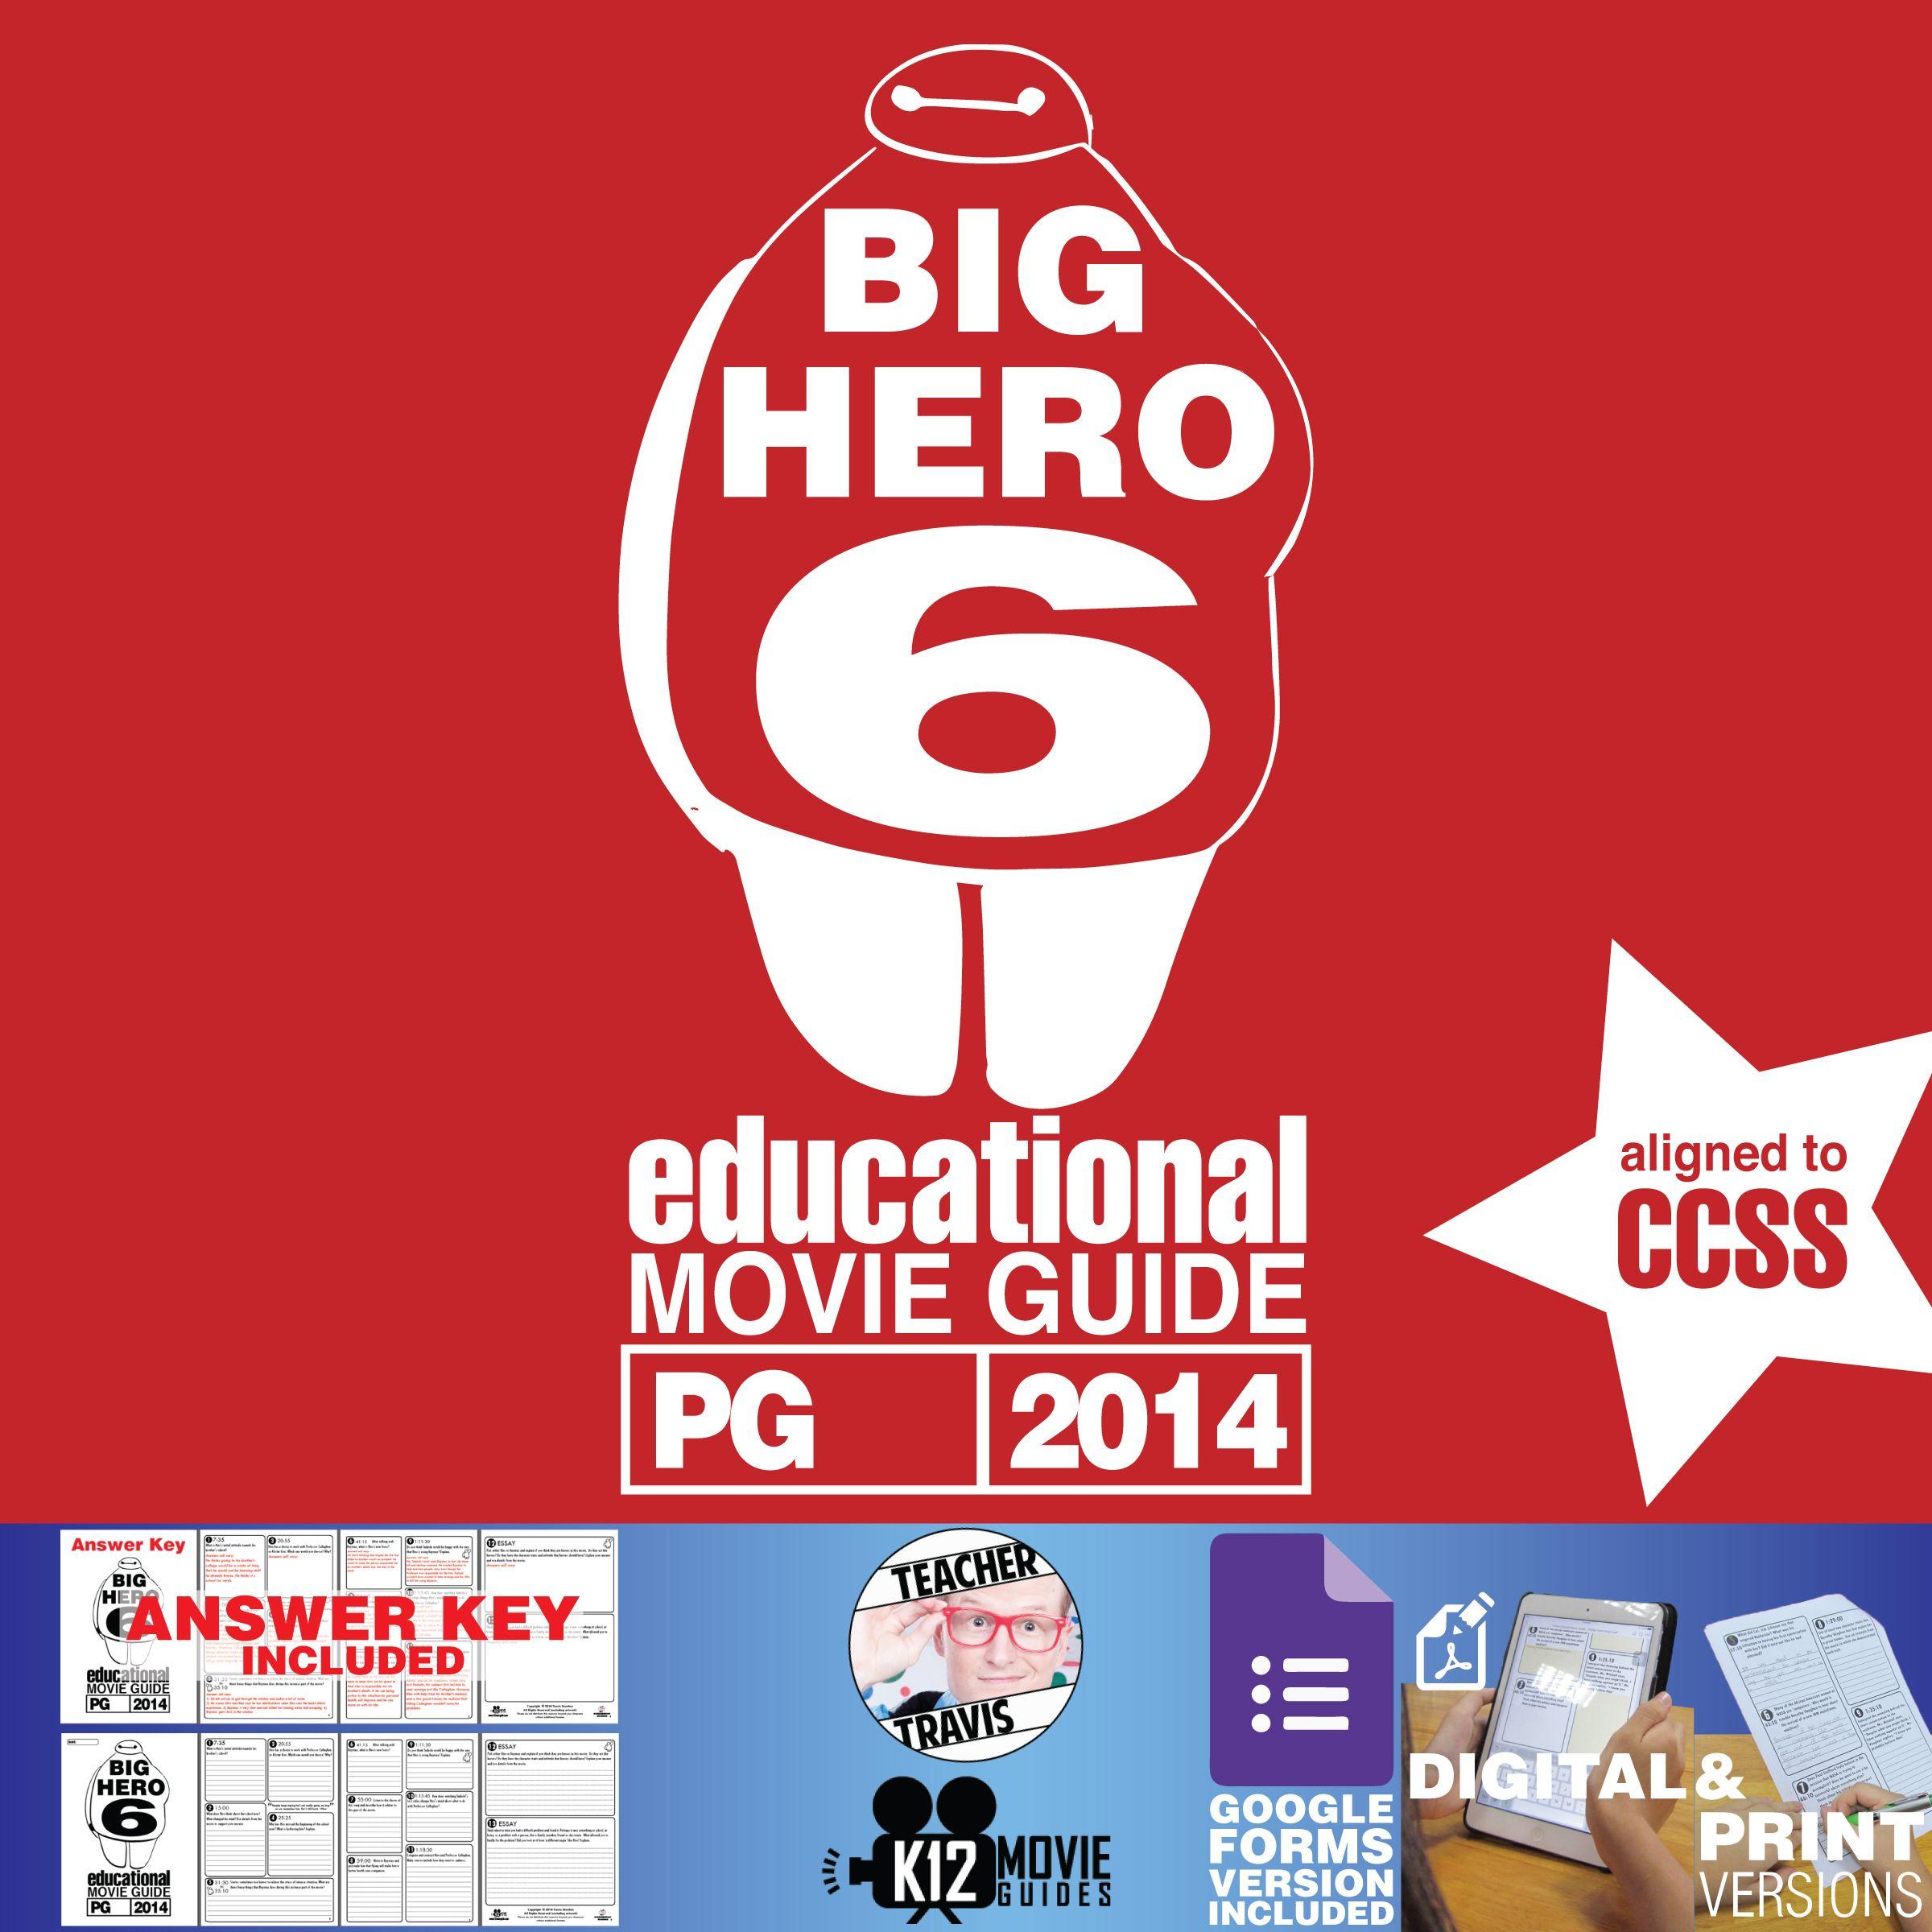 Big Hero 6 Movie Guide